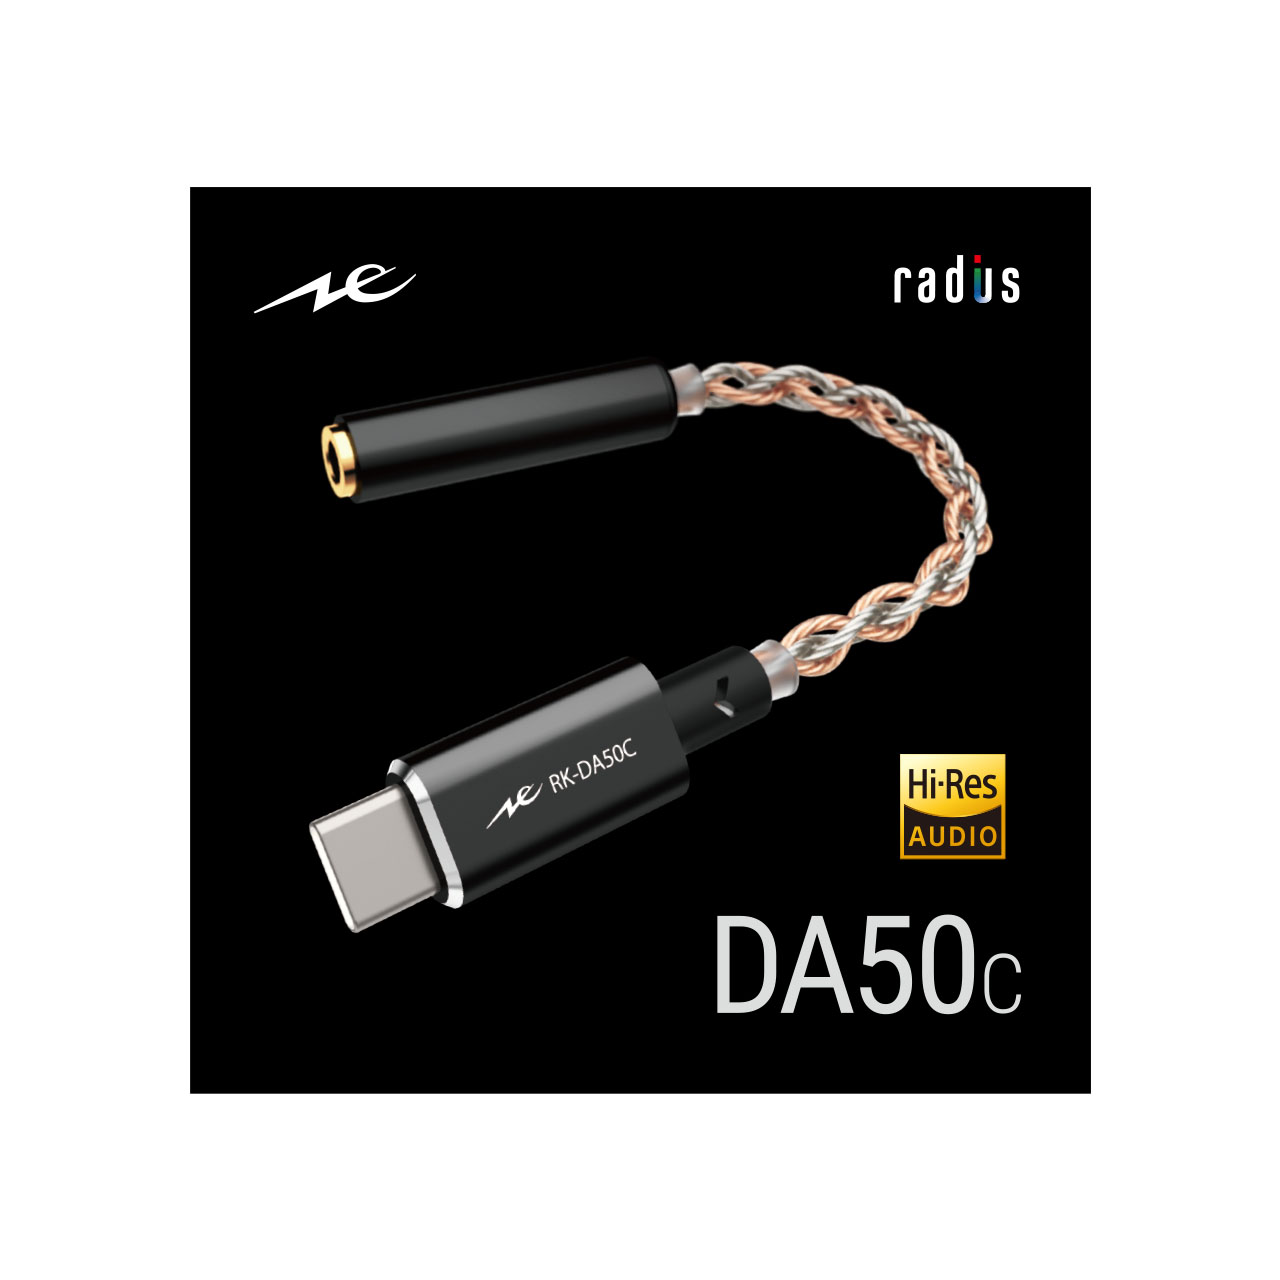 RK-DA50CK ラディウス USB Type-C接続 小型ポータブルDACアンプ